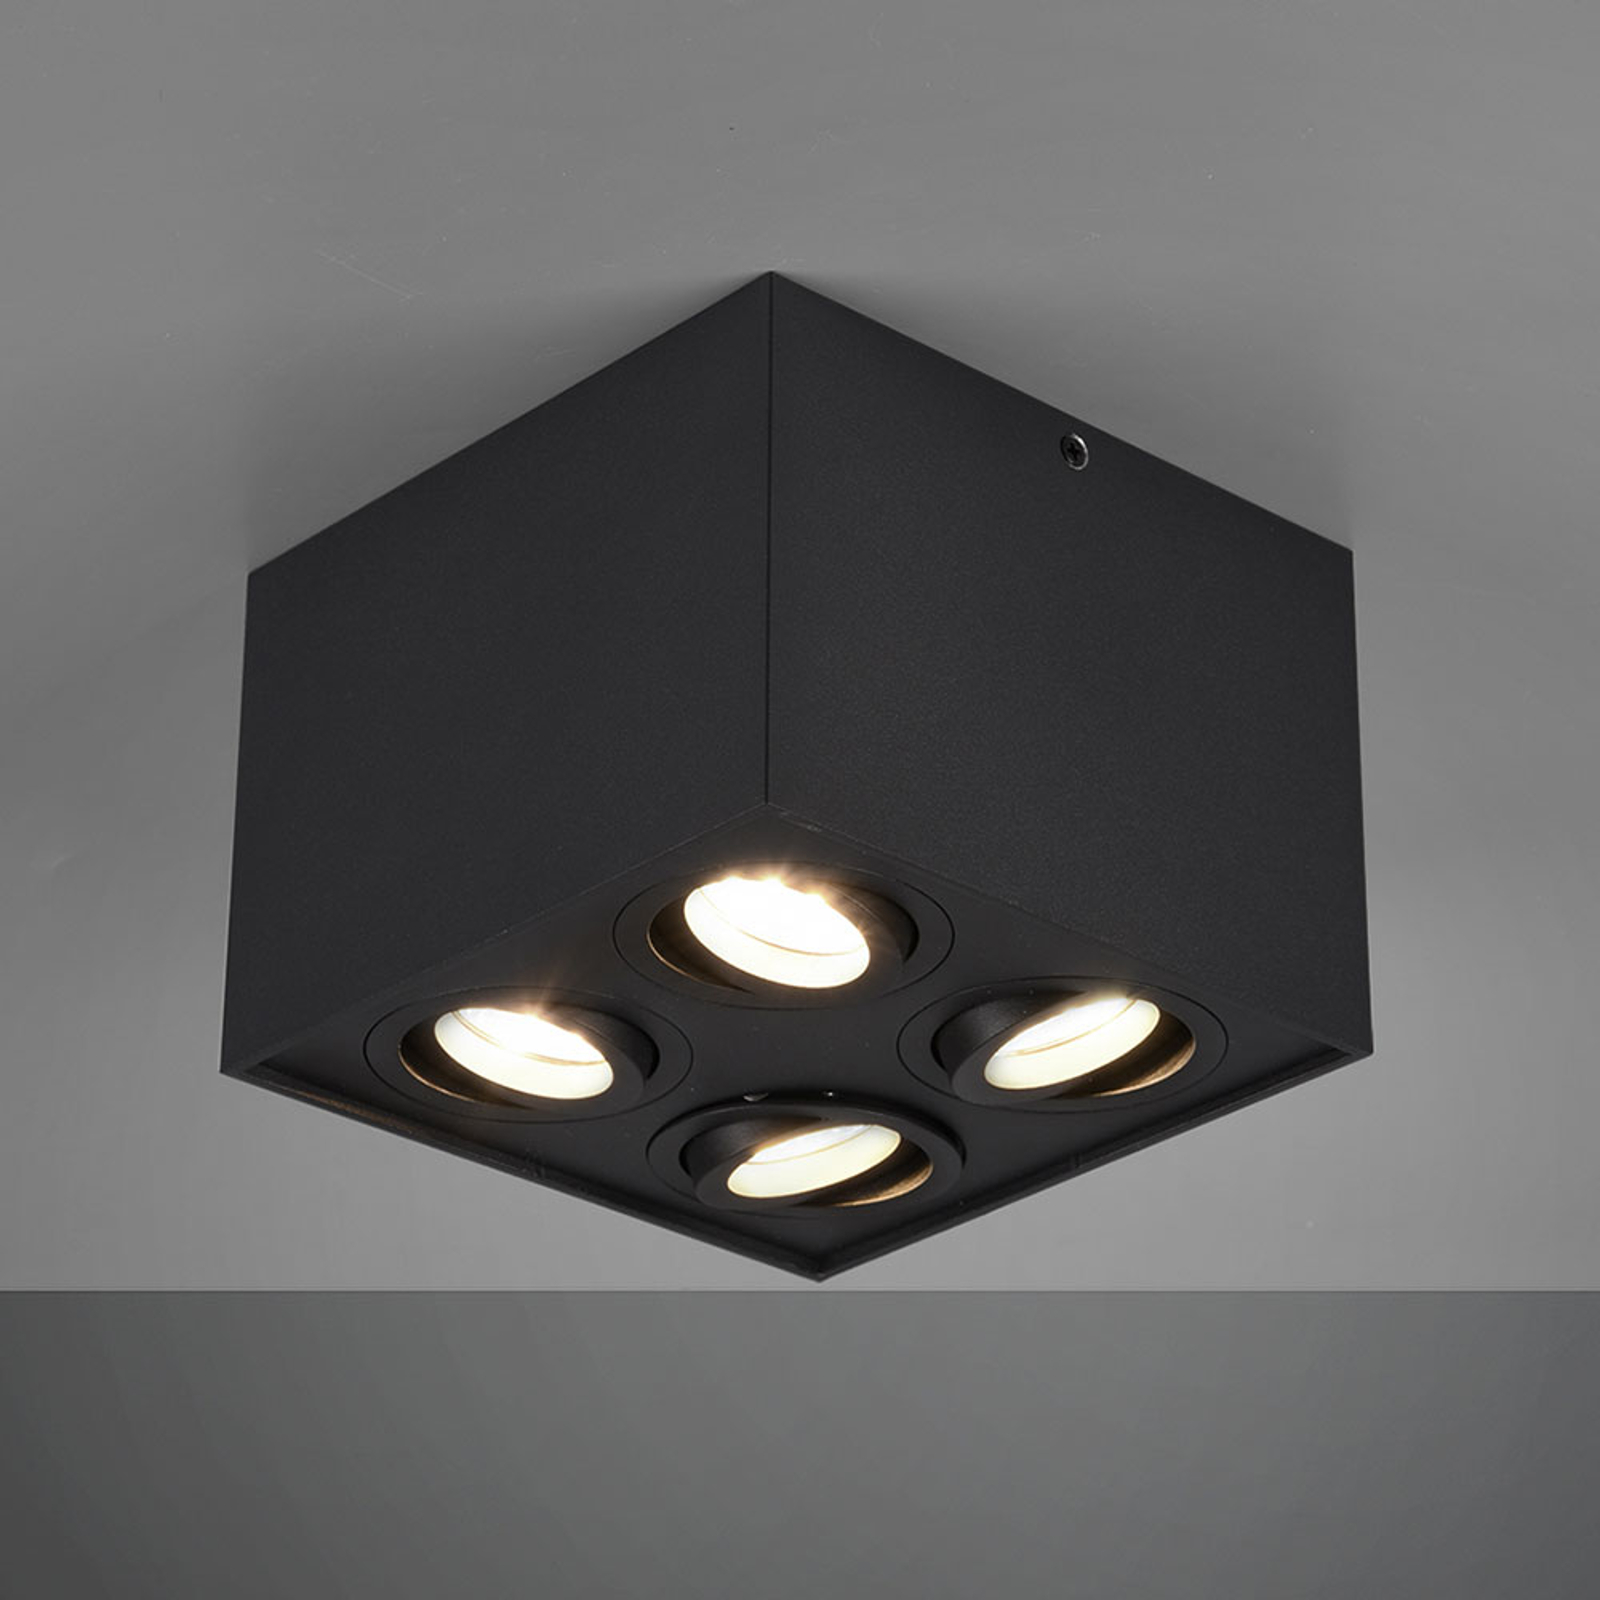 Plafondlamp Biscuit, 4-lamps, zwart